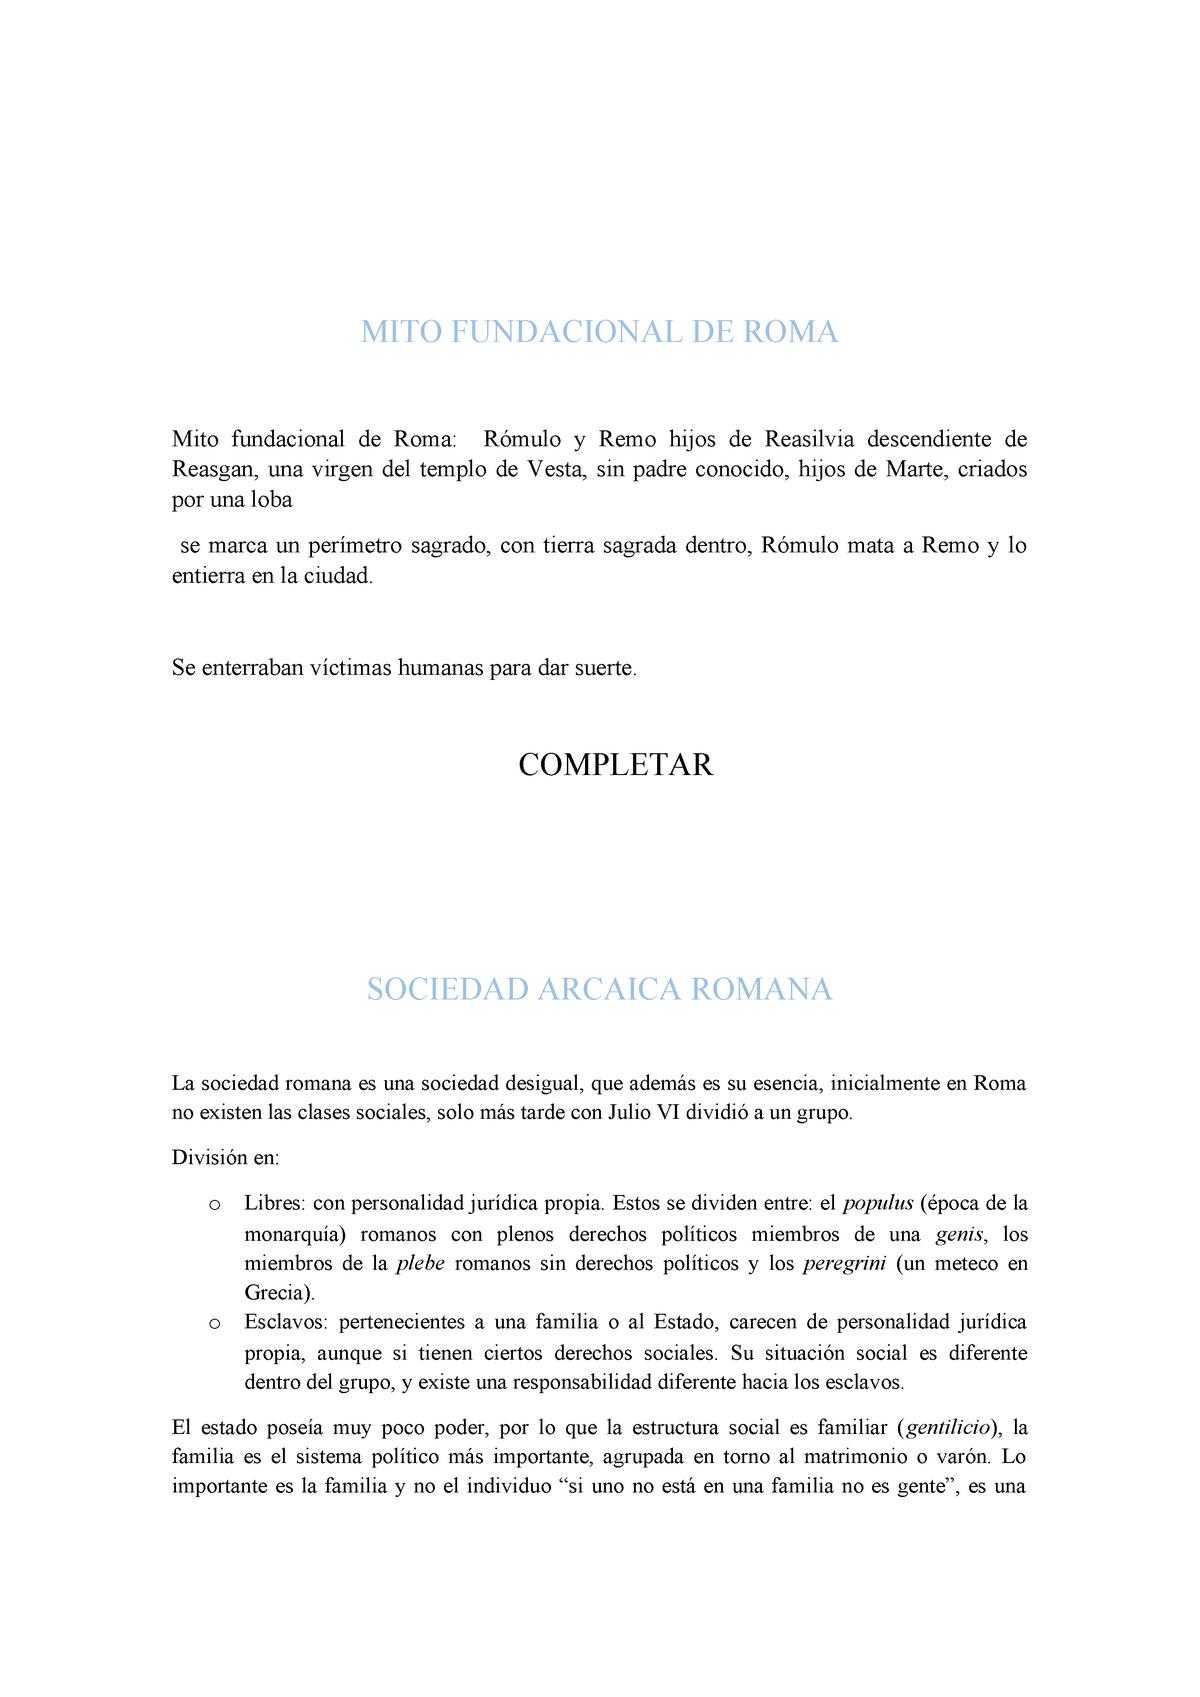 Sociedad Arcaica Romana 803861 Studocu